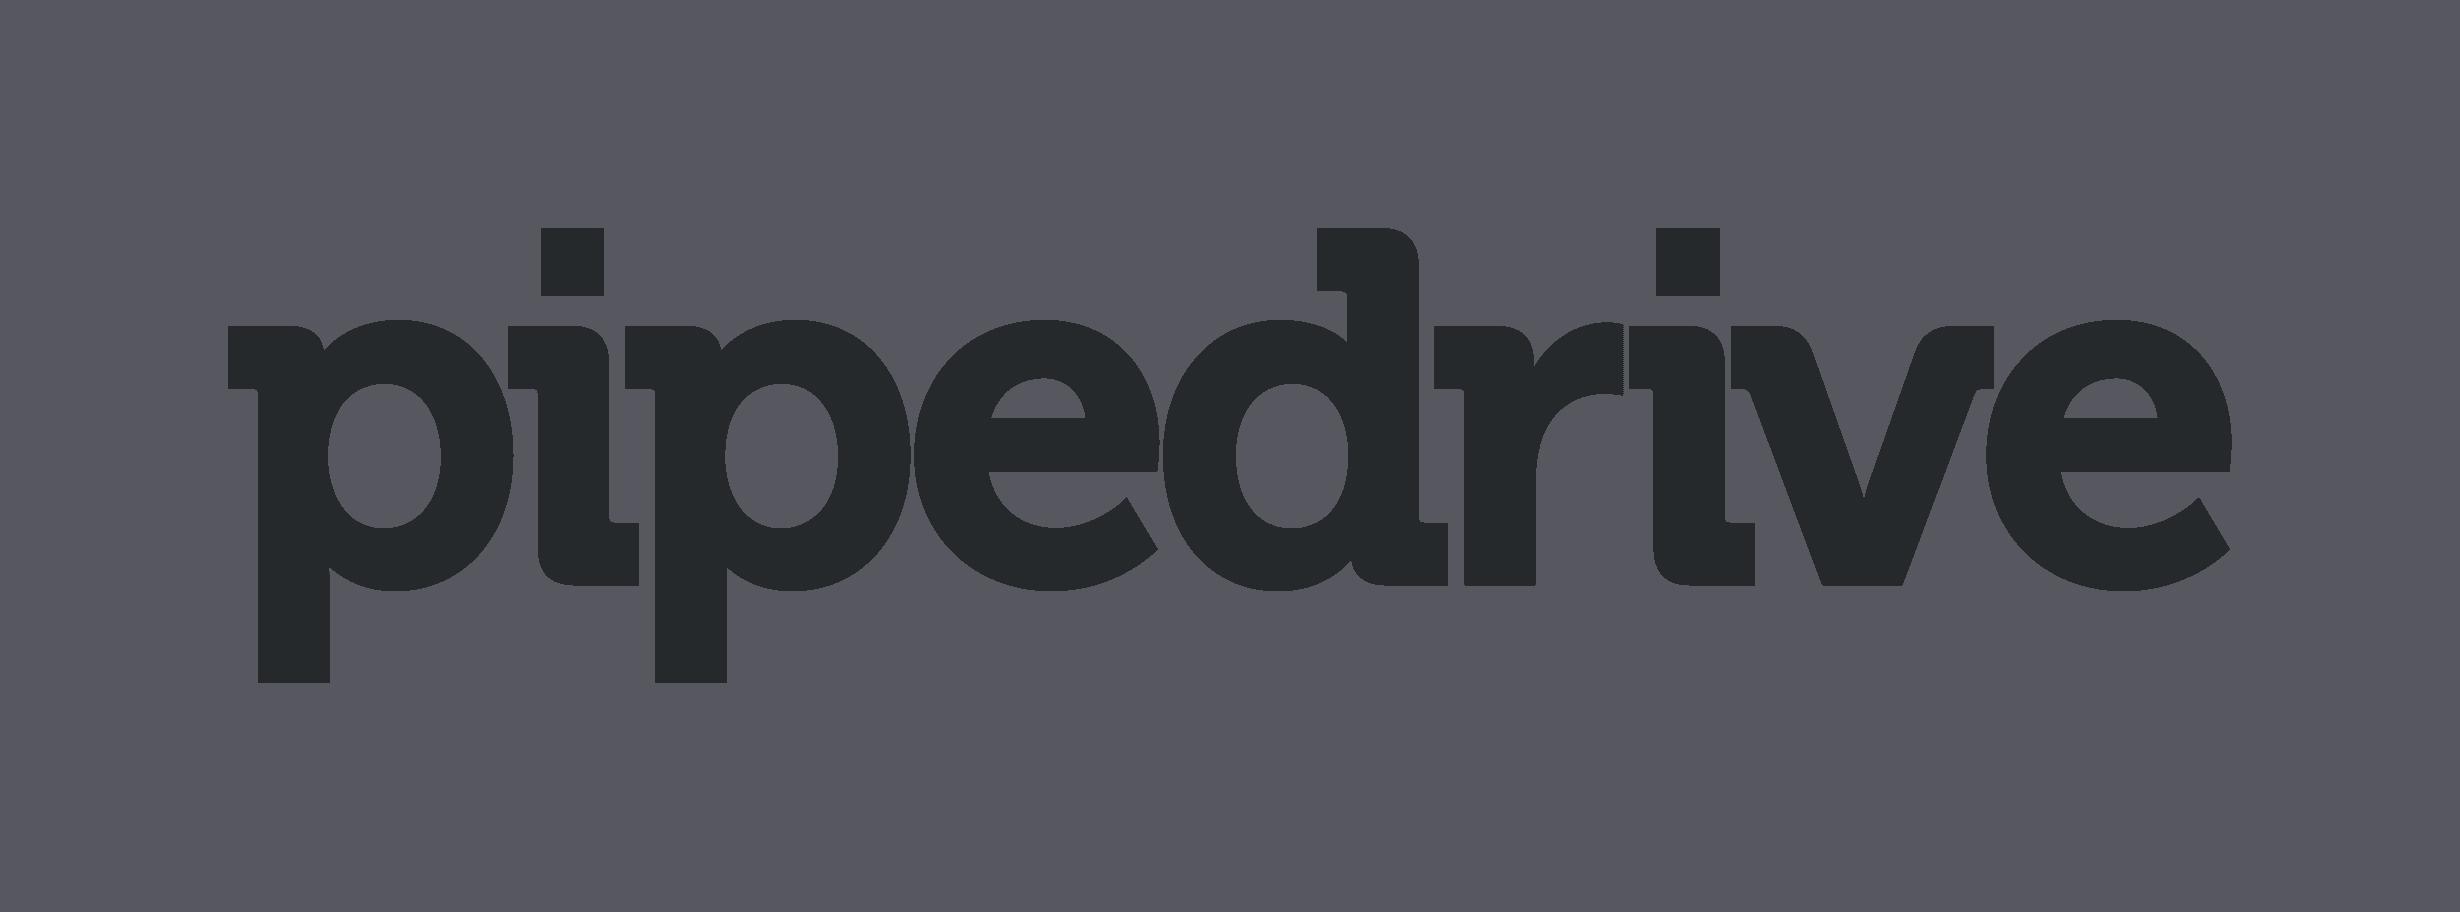 Pipedrive alternative